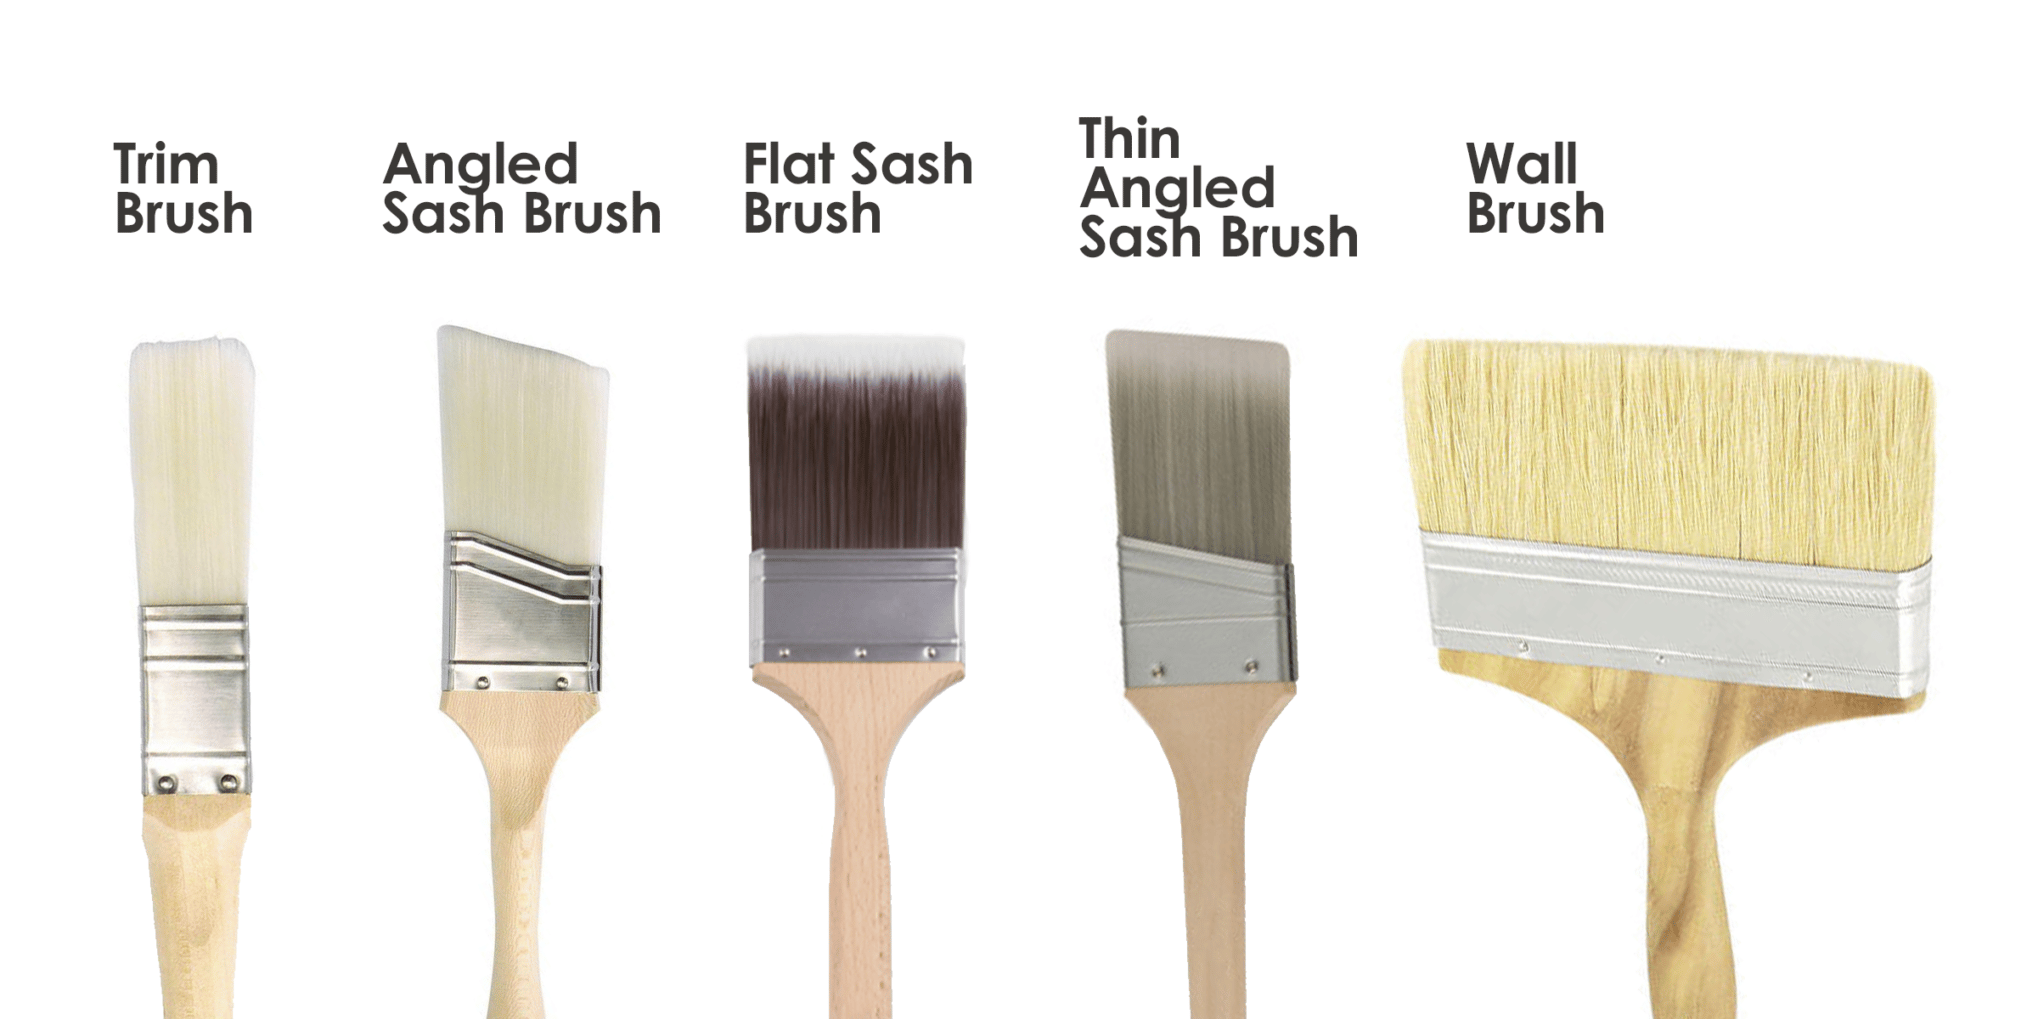 Different Brush Styles: Trim, Angles Sash, Flat Sash, Thin Angled Sash, Wall